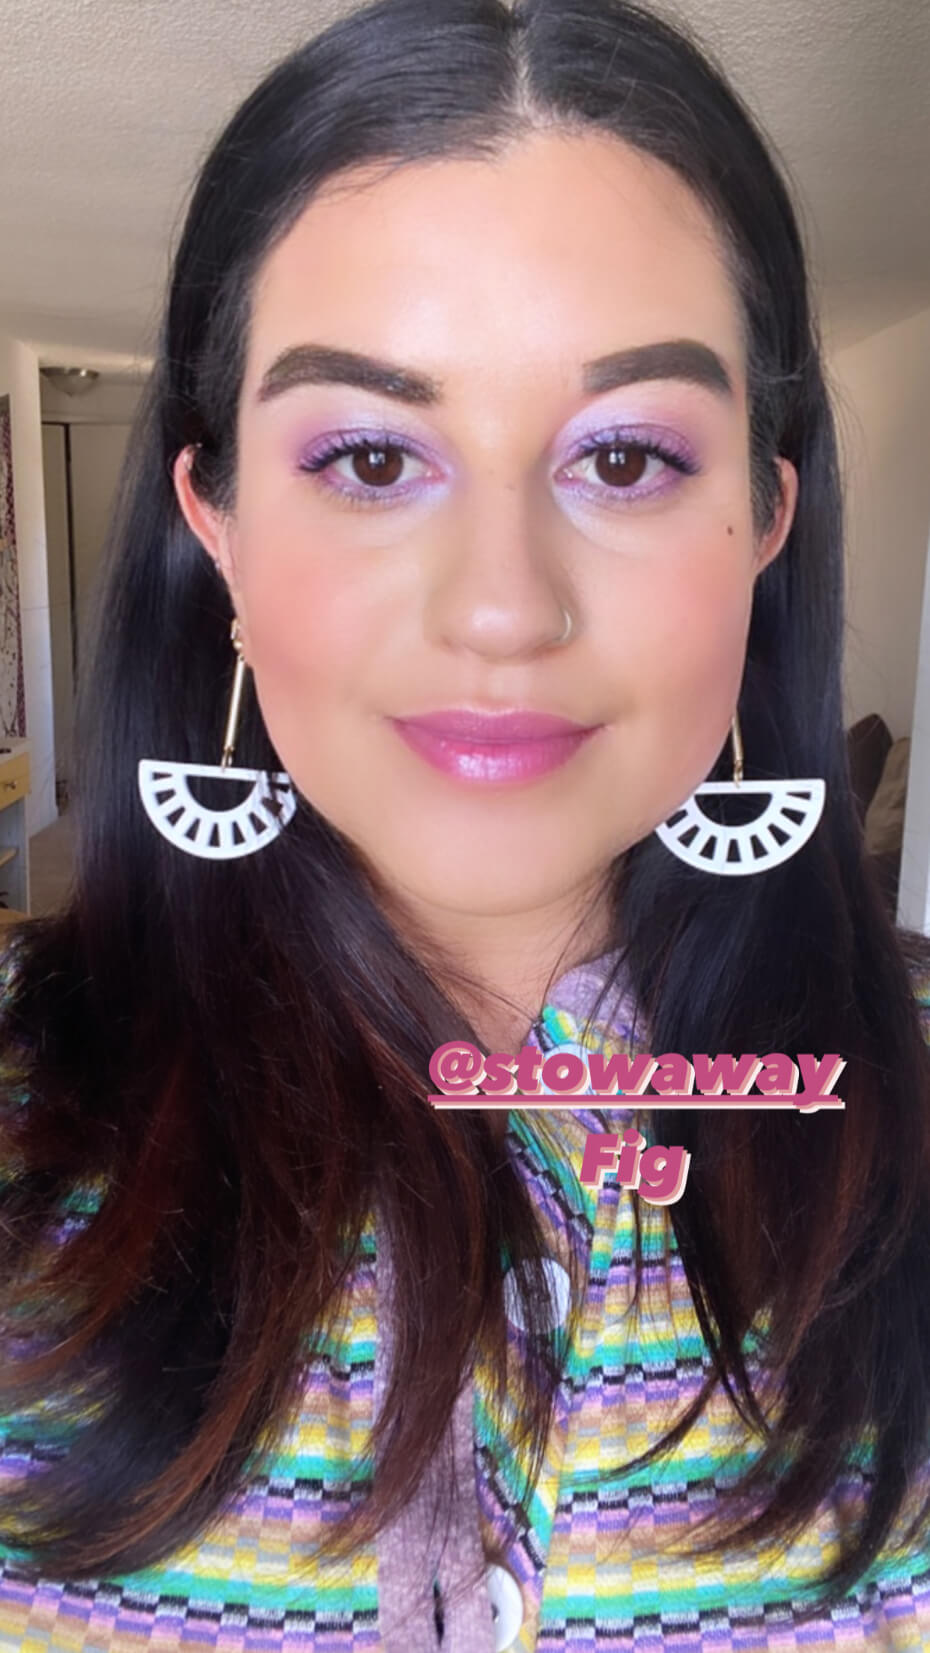 purple-lipstick-stowaway-fig-050520